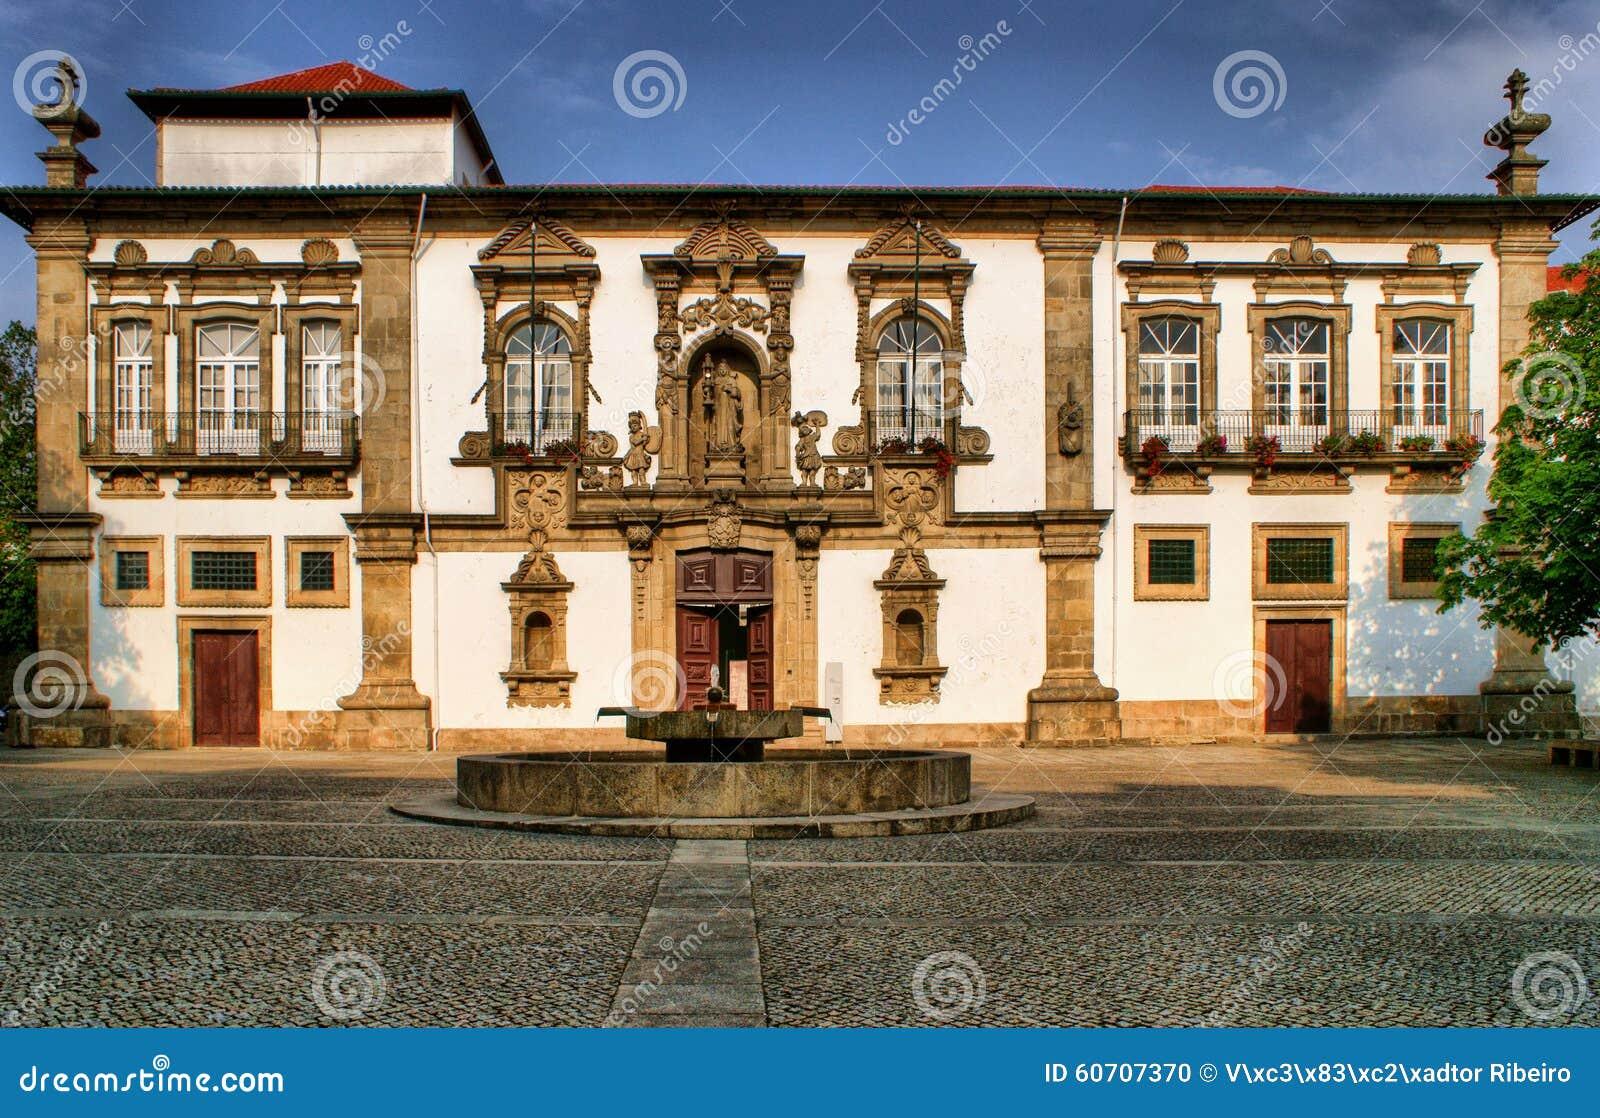 Guimaraes City-Hall in the former Santa Clara convent